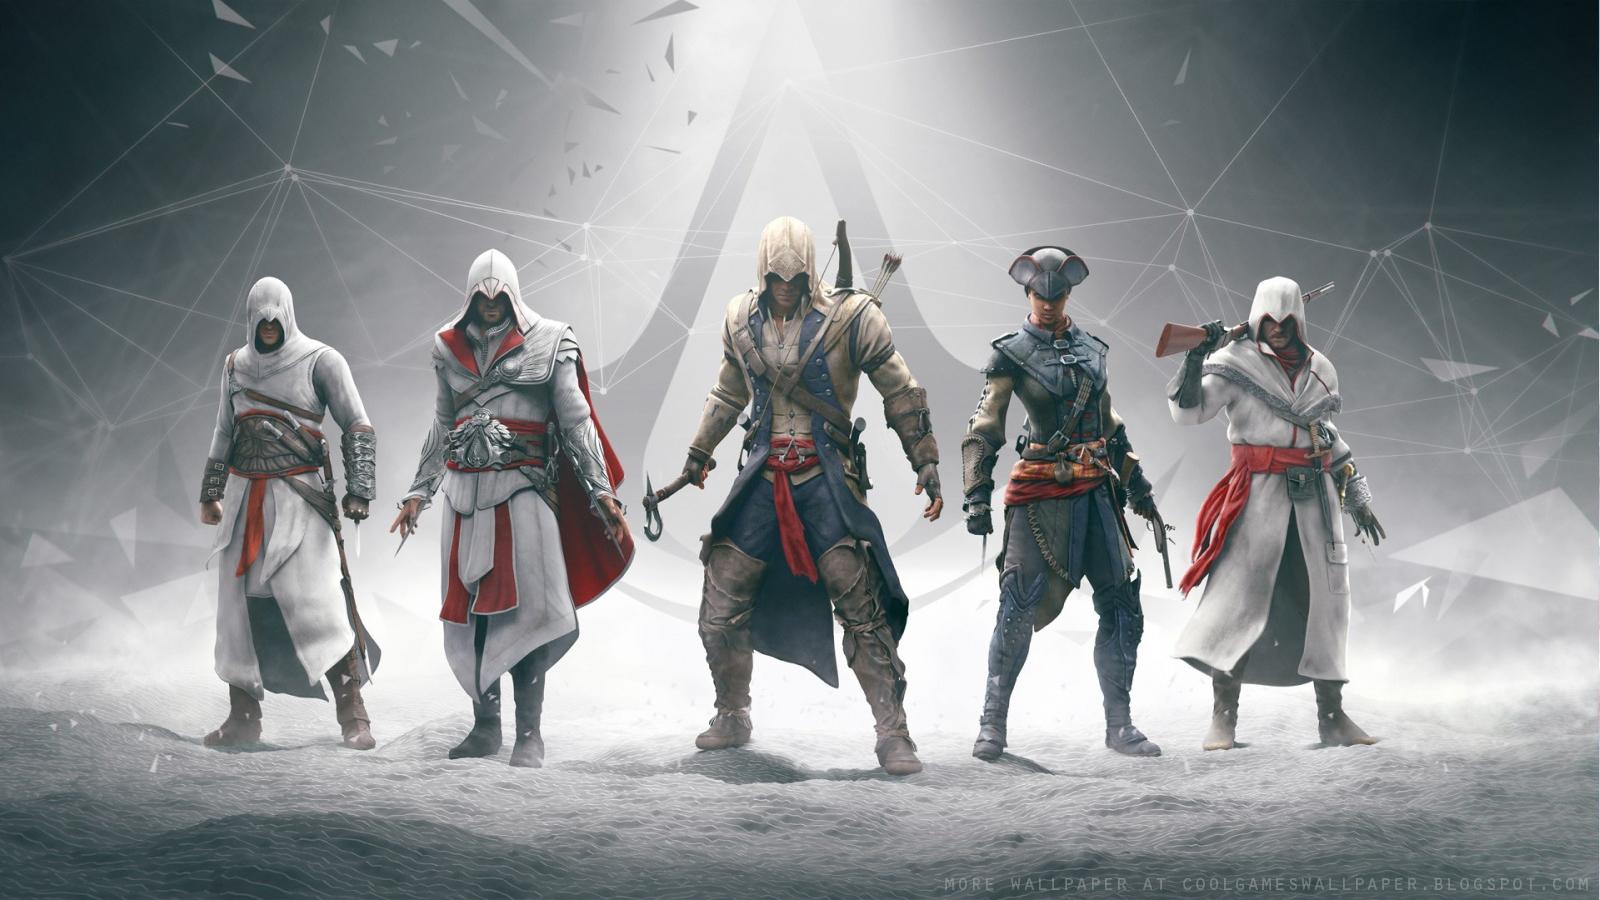 Assassins Creed 3 Wallpaper 1   Cool Games Wallpaper 1600x900